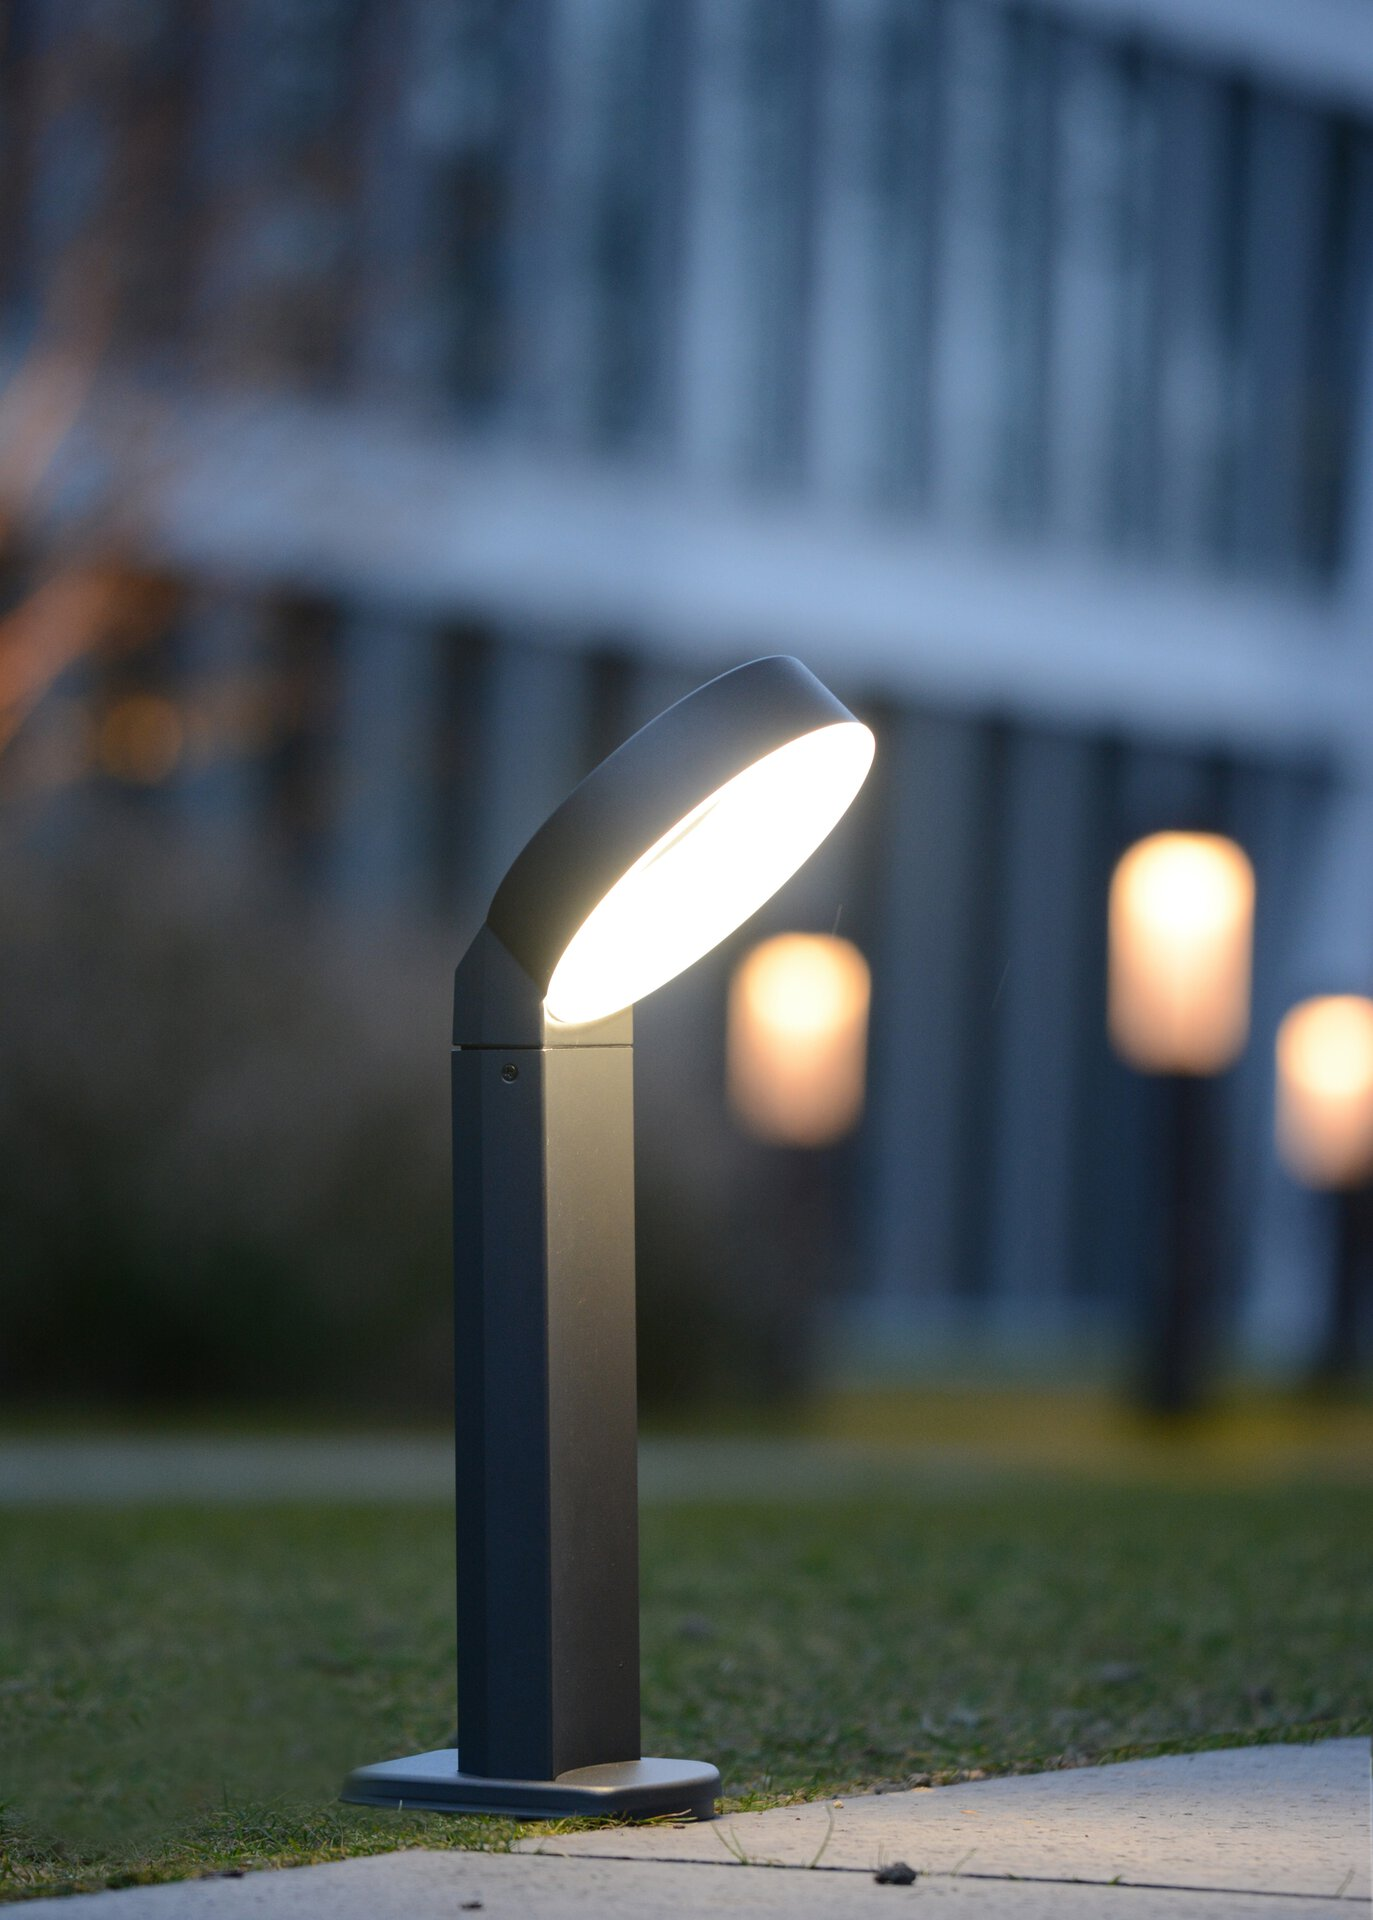 Wege-Außenleuchte Meridian Eco-Light Metall 18 x 73 x 21 cm